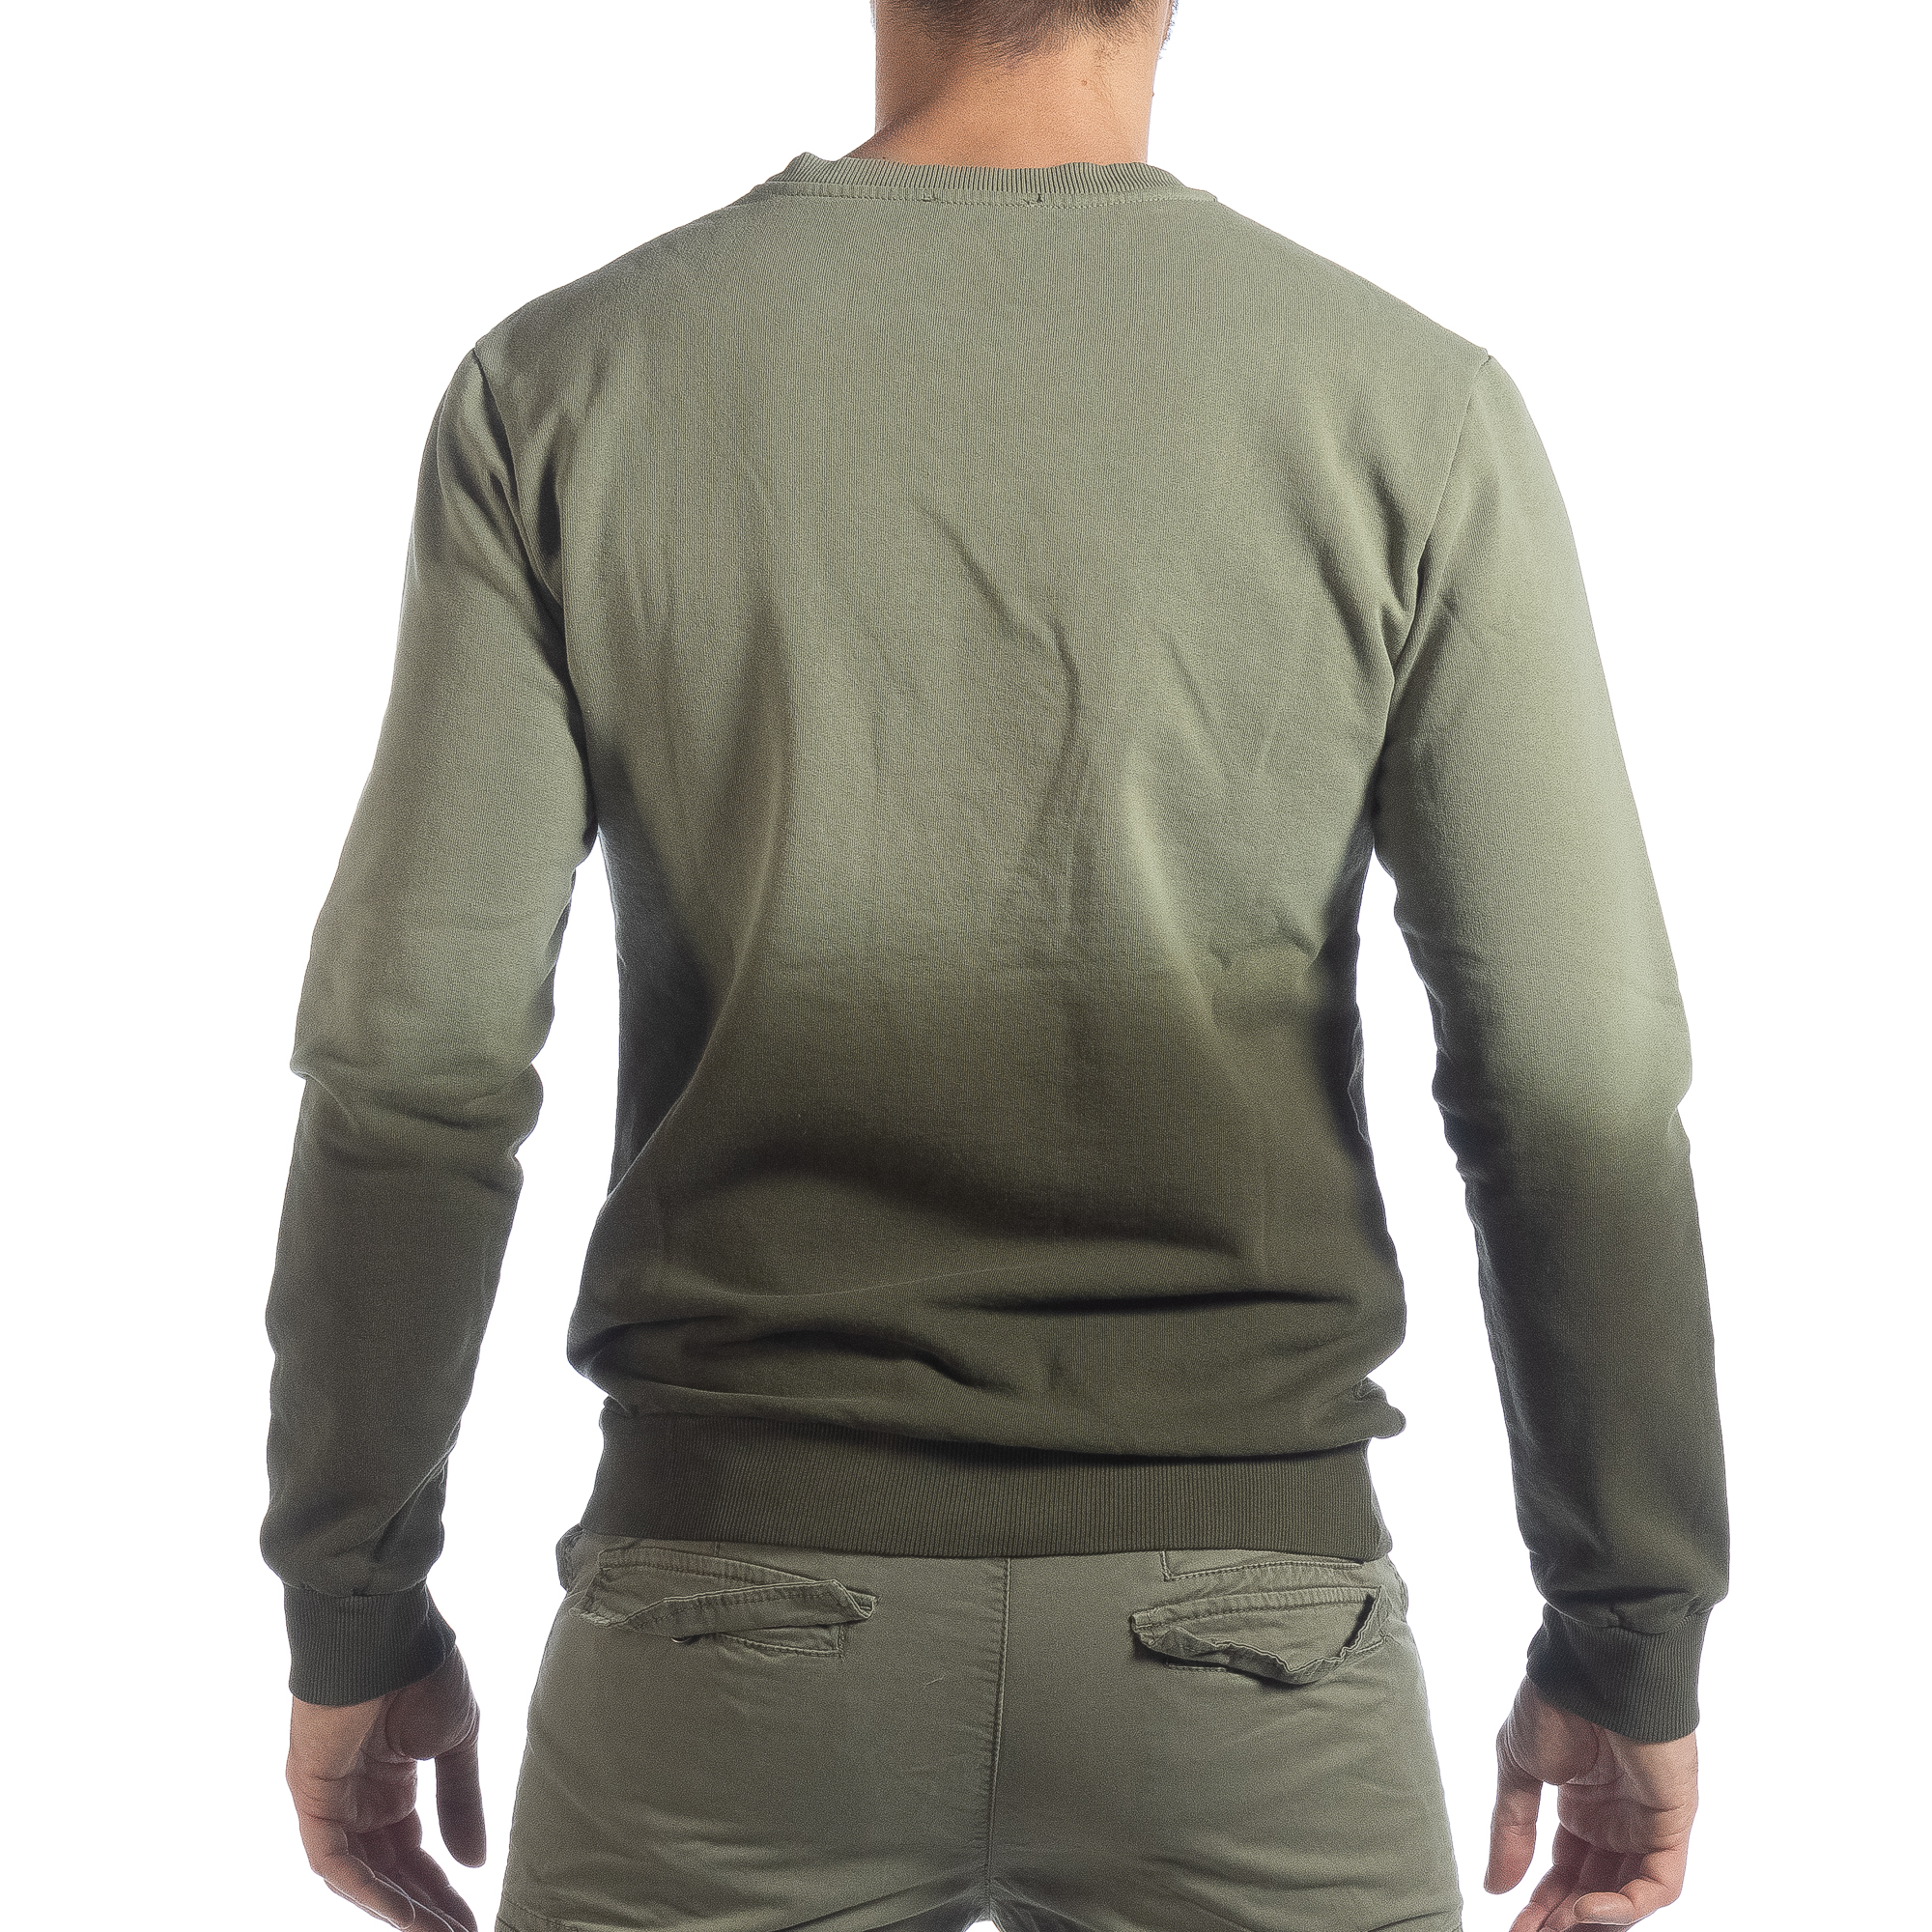 2a00ac53331c Ανδρική πράσινη μπλούζα με επένδυση